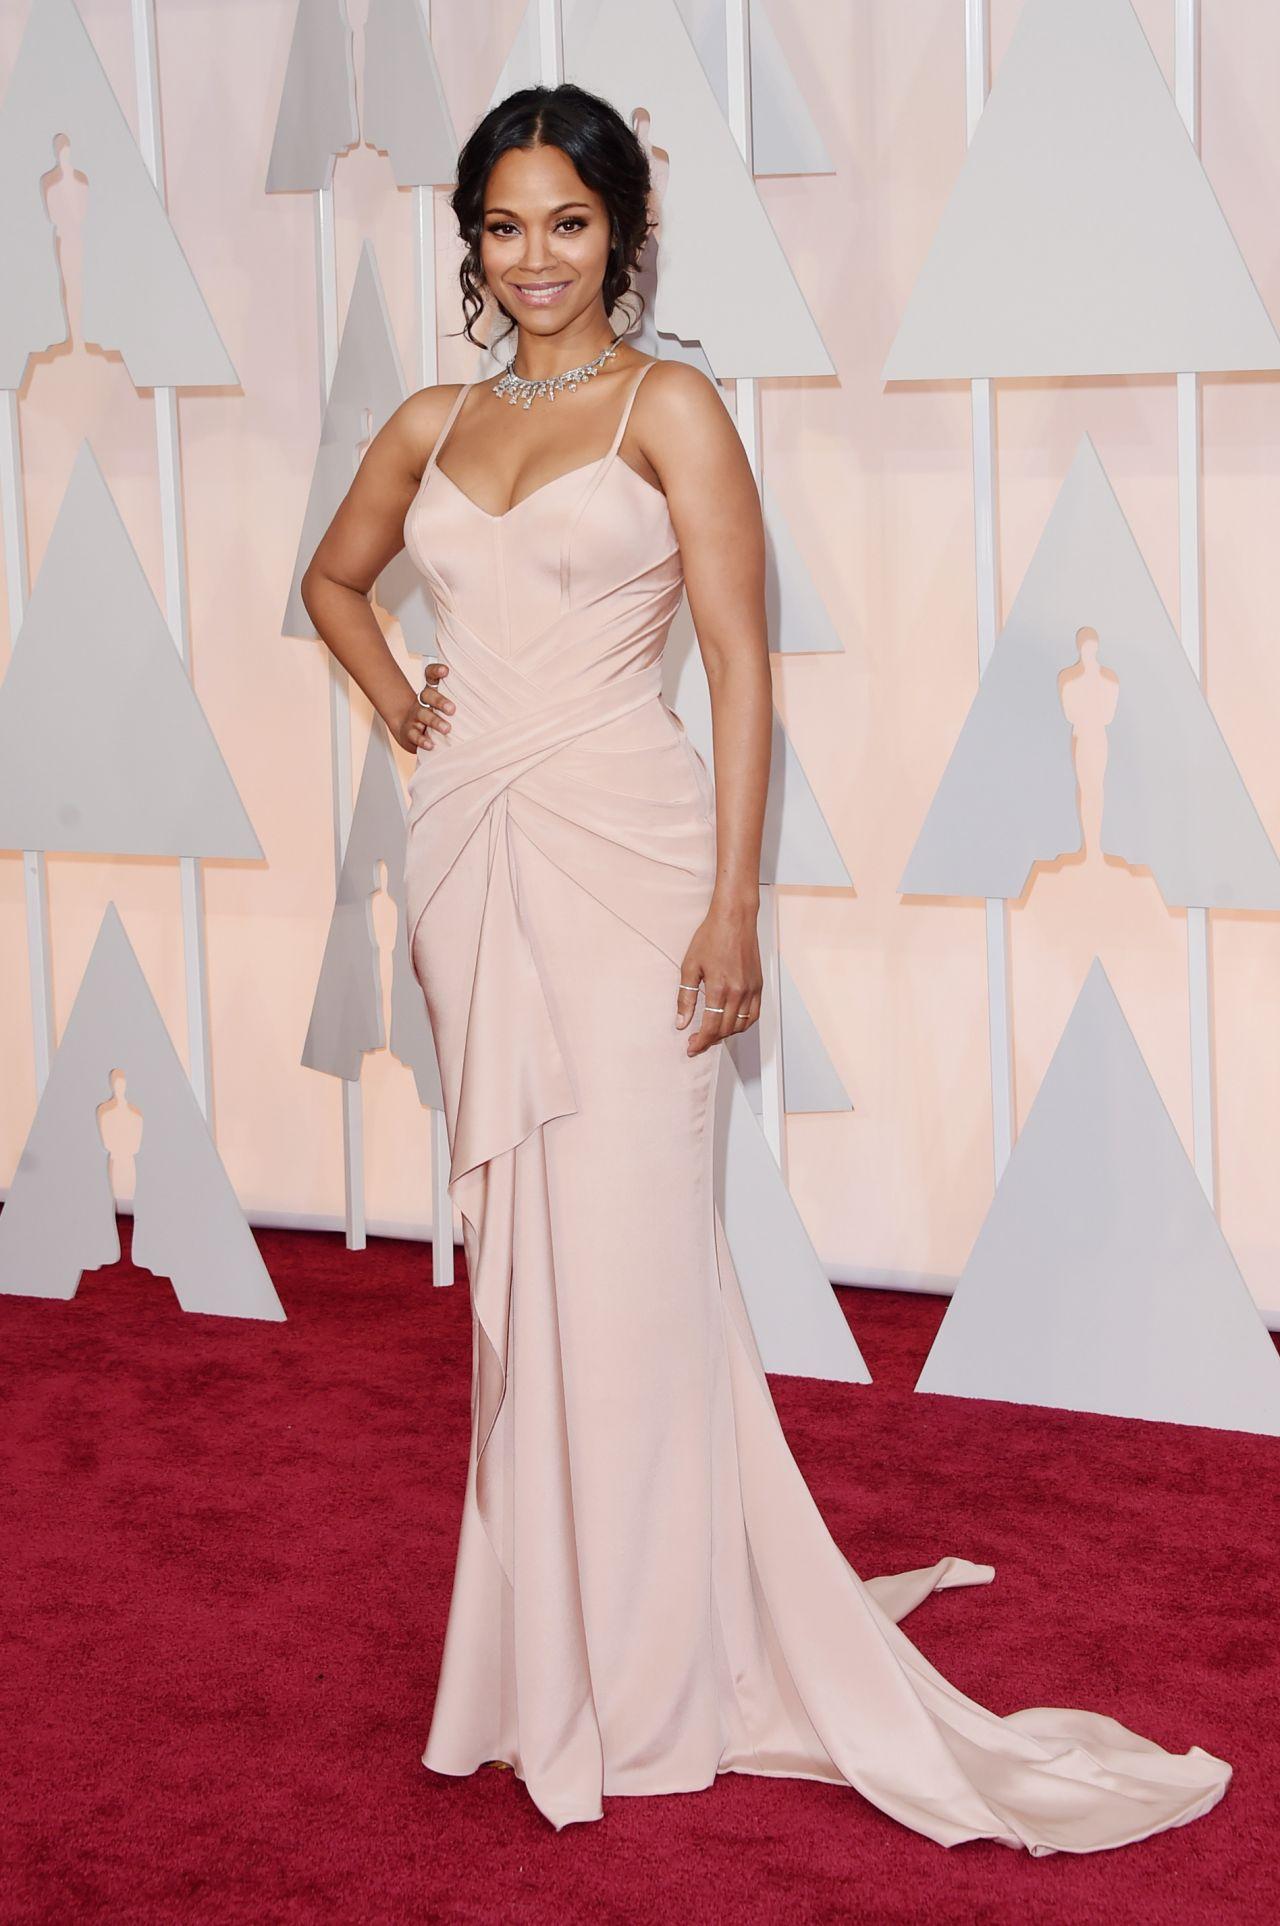 Zoe Saldana 2015 Oscars Red Carpet In Hollywood